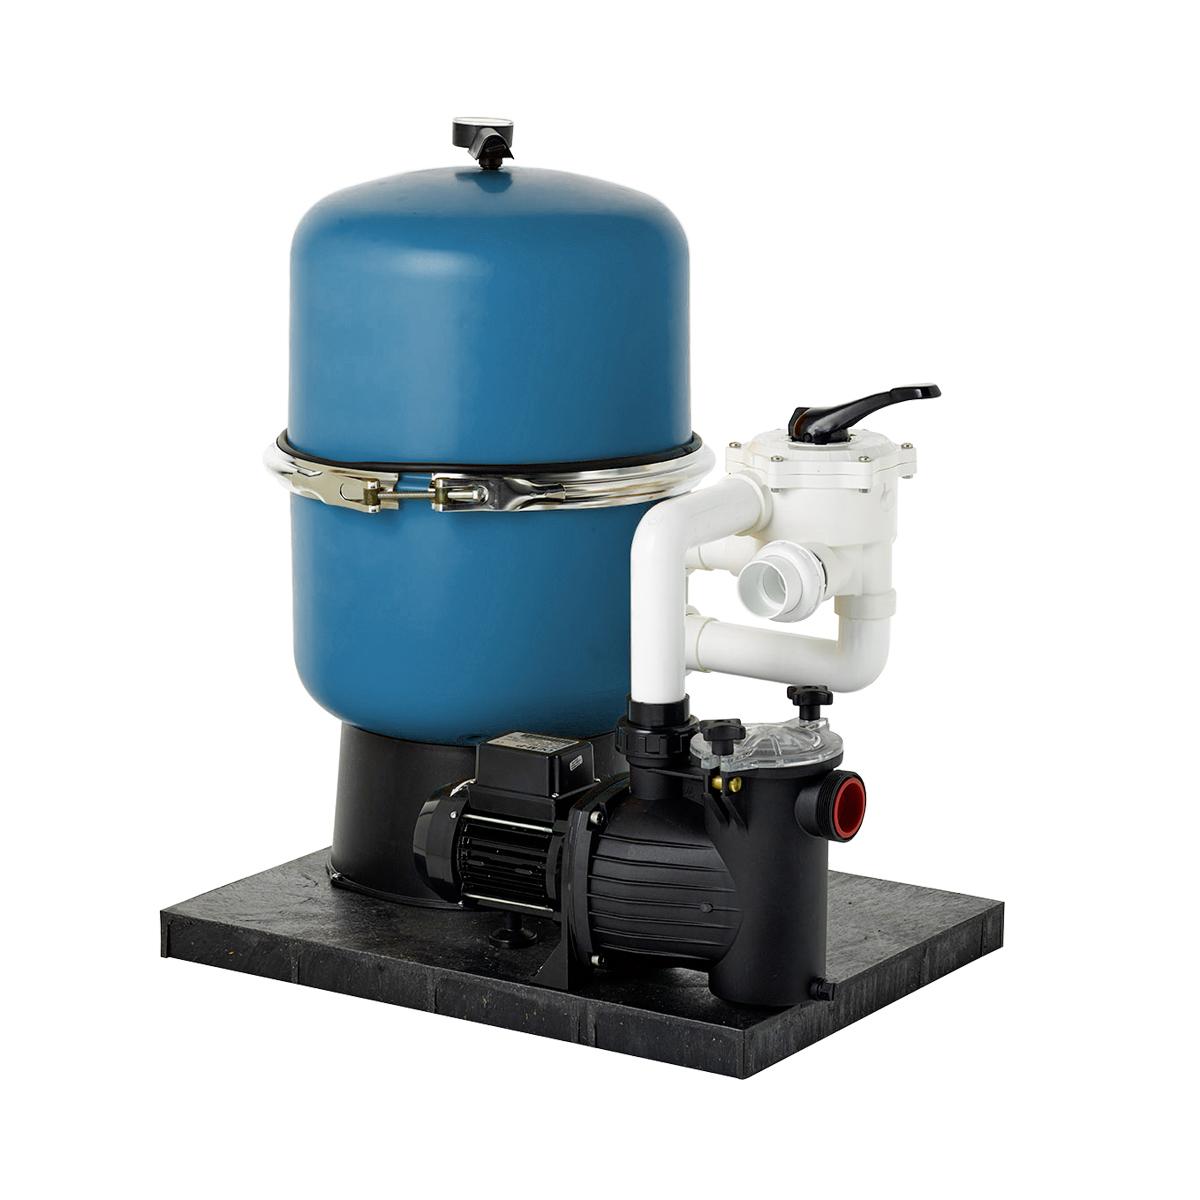 "Compact filter set GRAZ D400 2-parts, blue, incl. original  Praher 6-way valve 1 1/2"", incl. pump 0,16 kW(0,25 HP) 6 m3/H Compact filter set GRAZ D400 2-parts, blue, incl. original  Praher 6-way valve 1 1/2"", incl. pump 0,16 kW(0,25 HP) 6 m3/H"